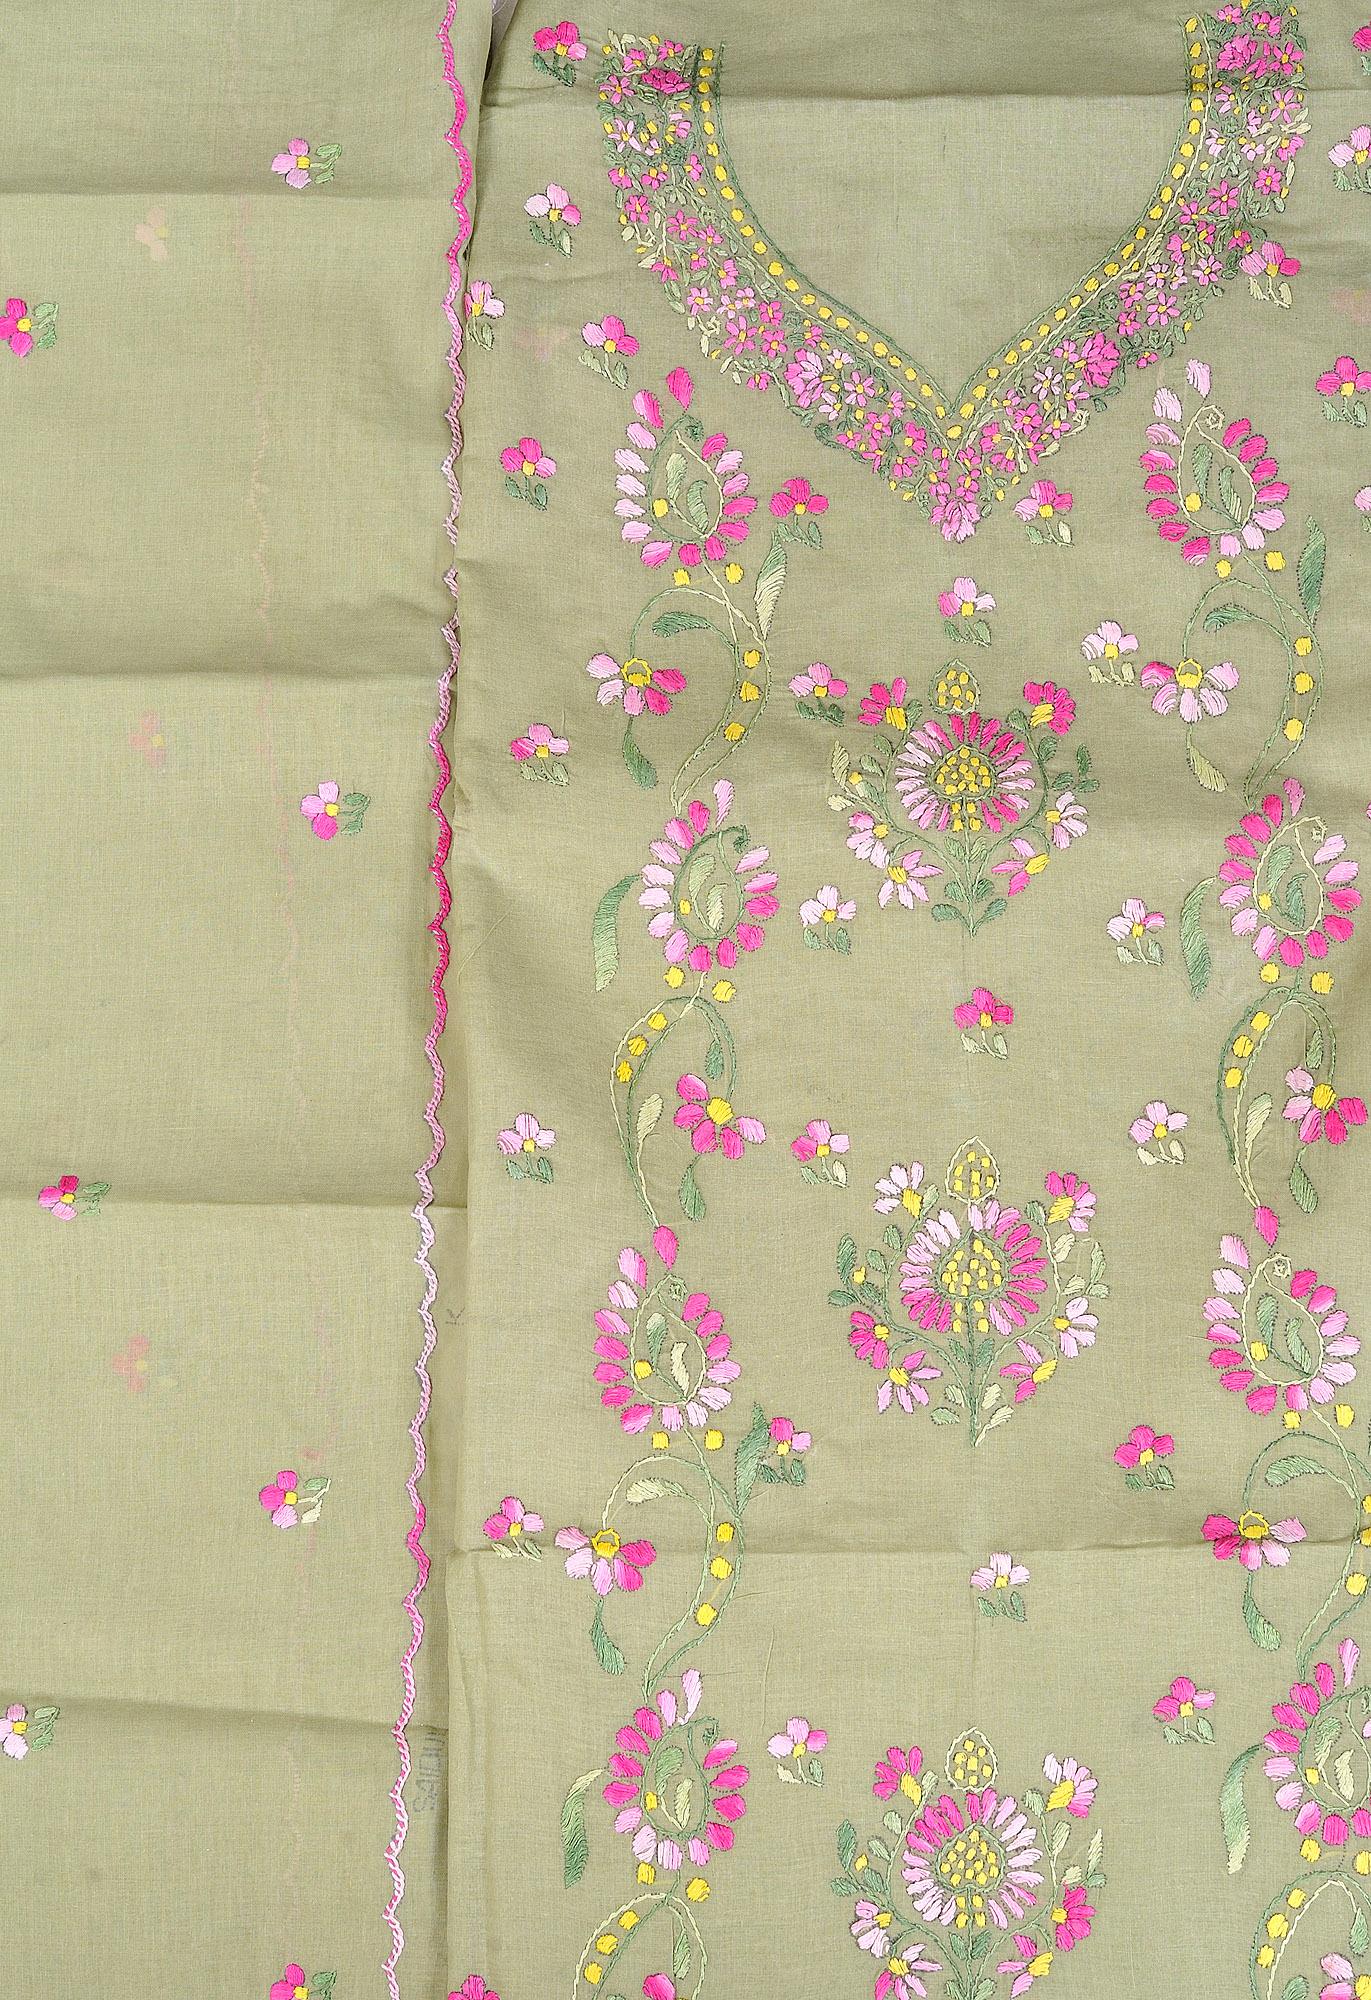 Winter pear salwar kameez fabric from kolkata with kantha